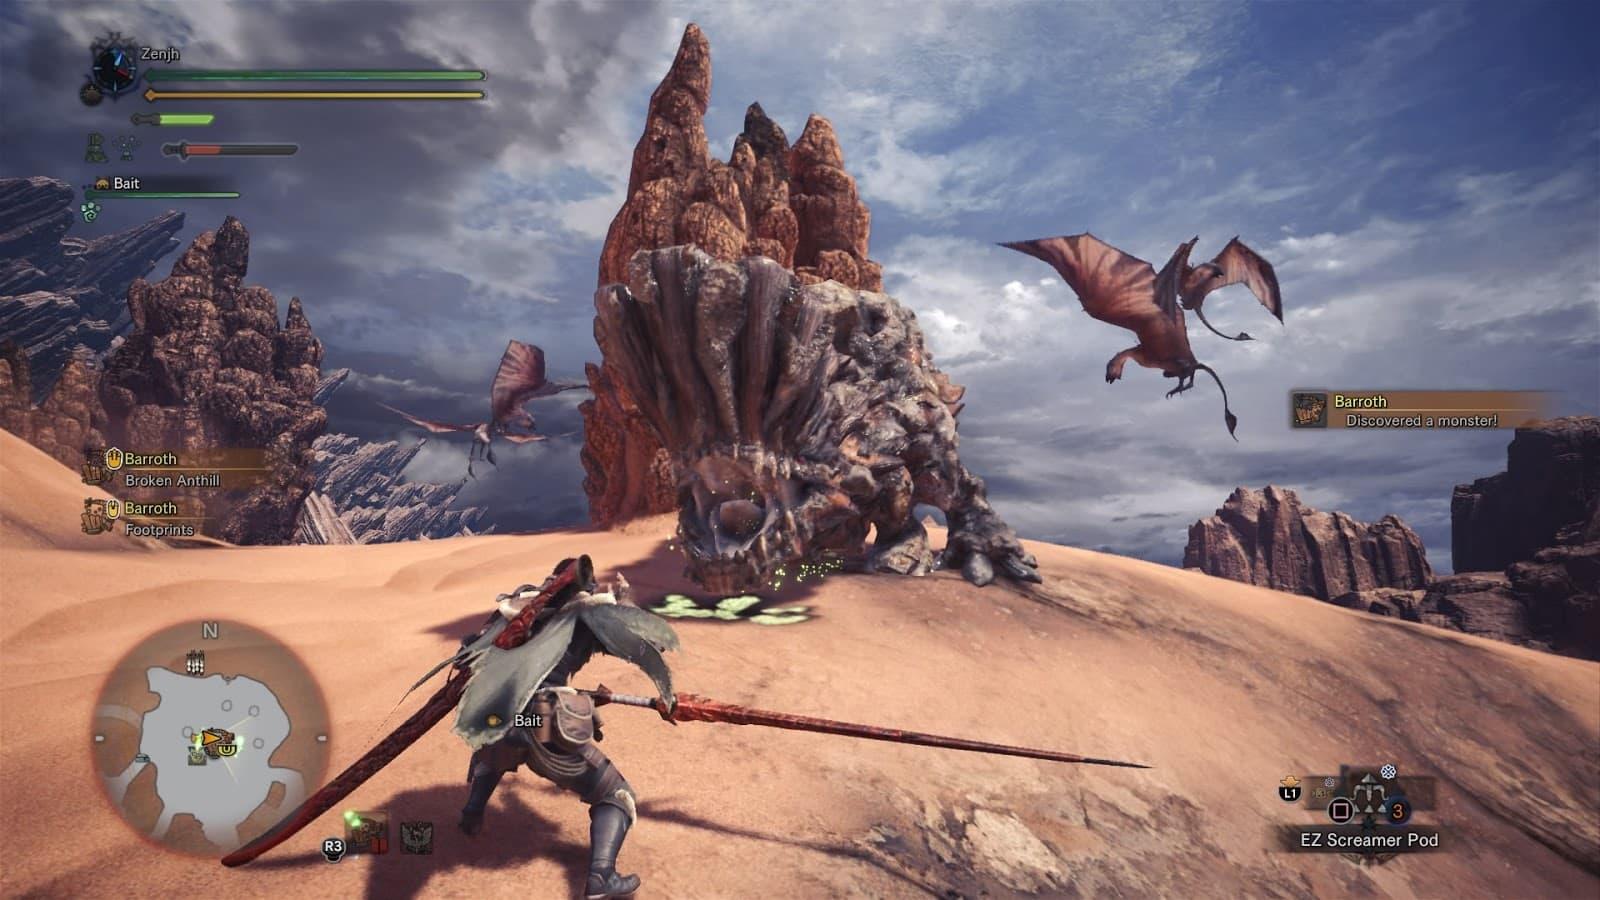 monster hunter world gameplay 3 min - سی دی کی اشتراکی MONSTER HUNTER: WORLD